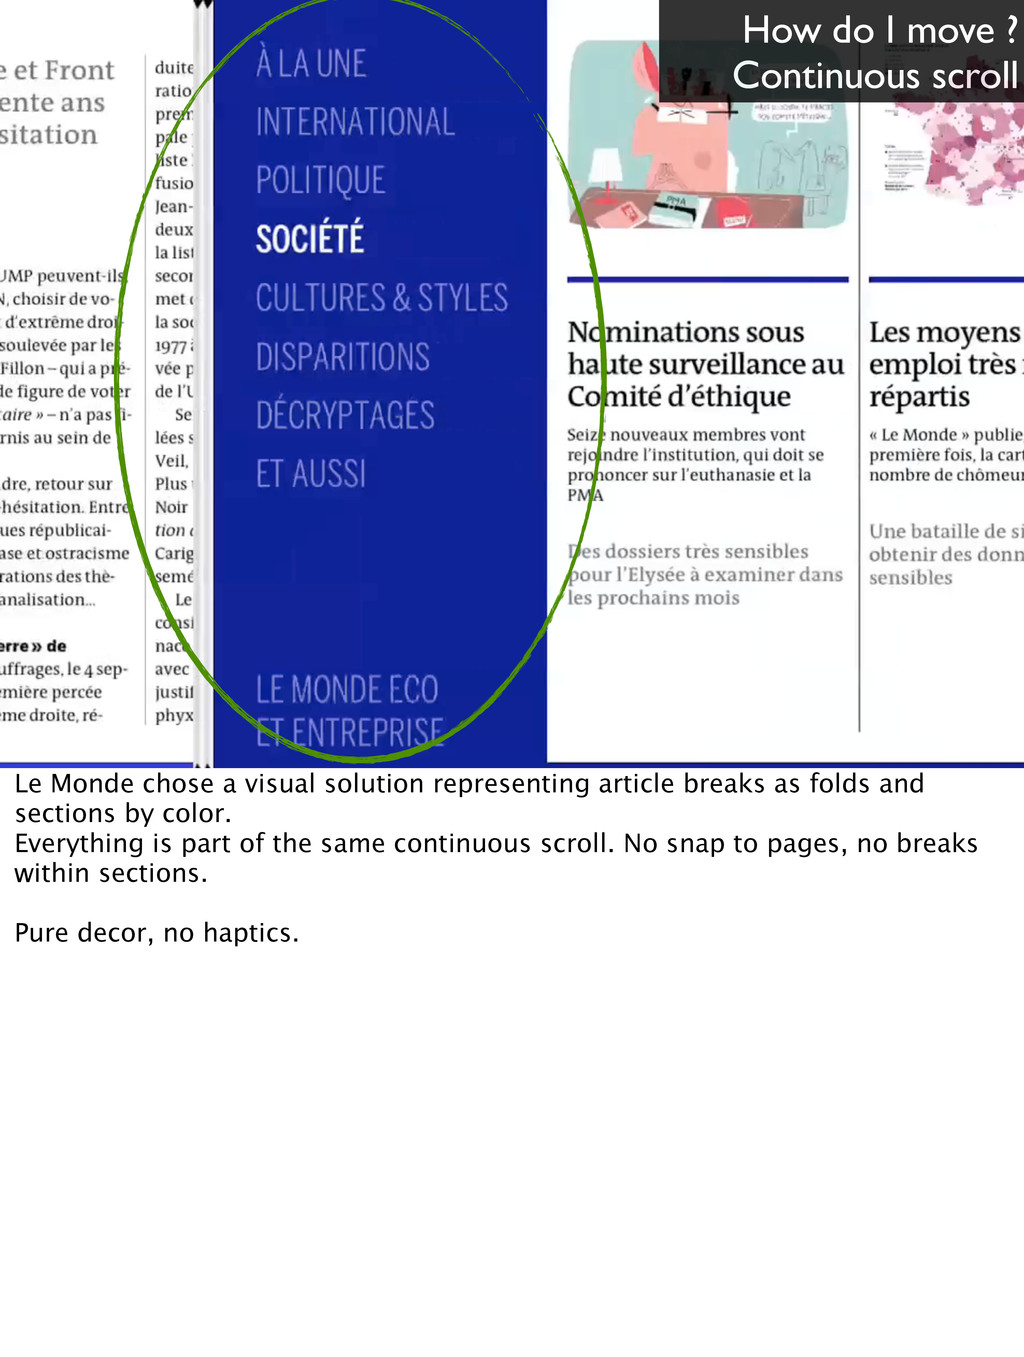 How do I move ? Continuous scroll Le Monde chos...